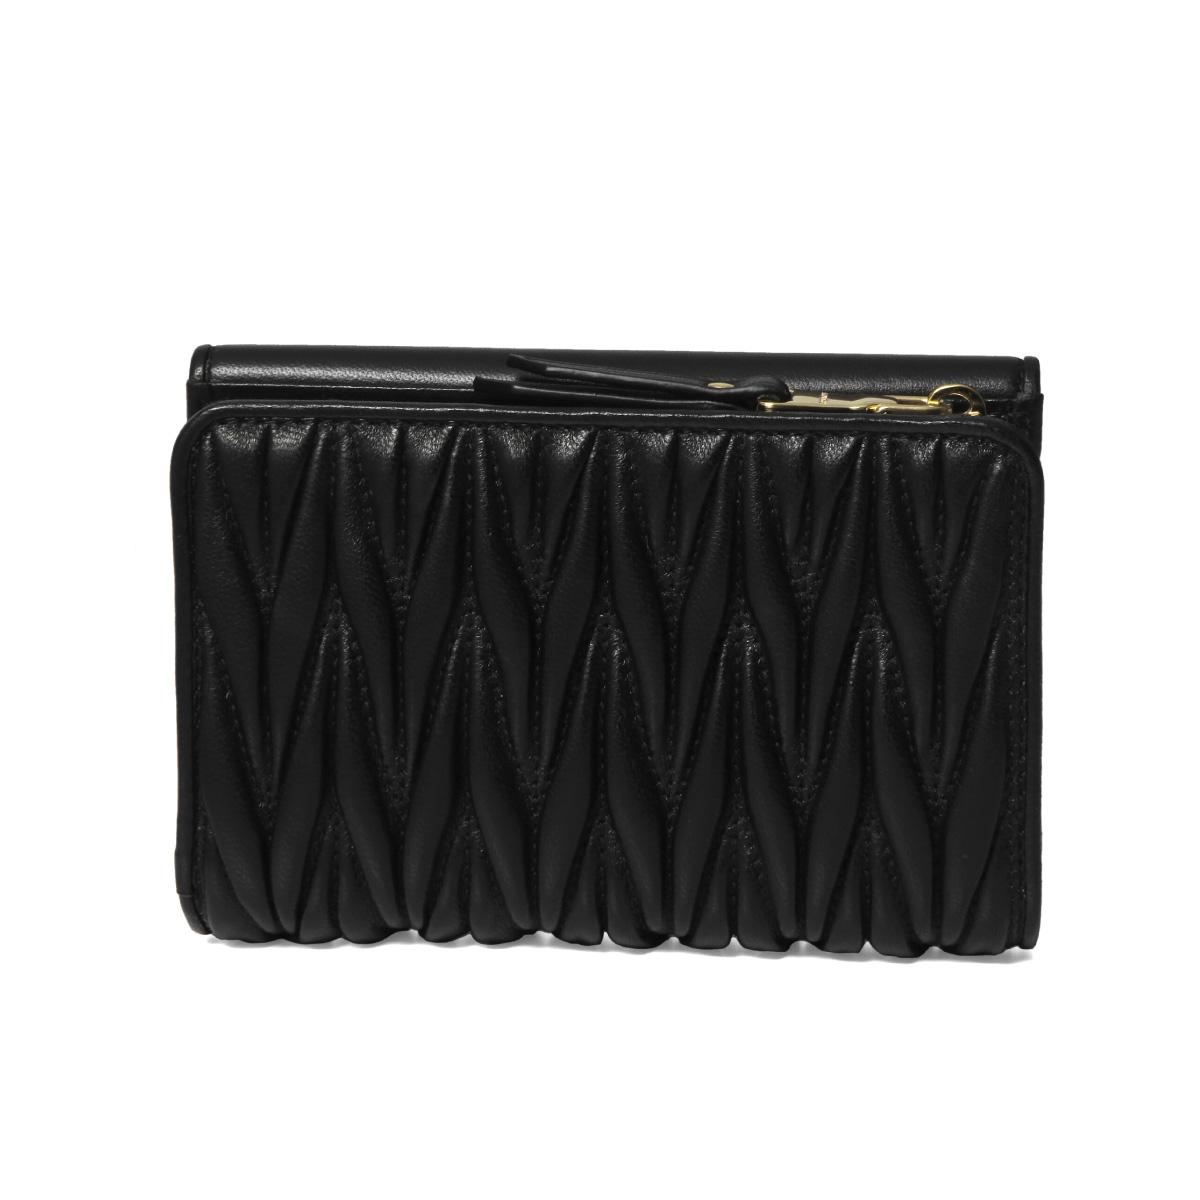 MIU MIU ミュウ ミュウ | 二つ折り財布 | MATELASSE